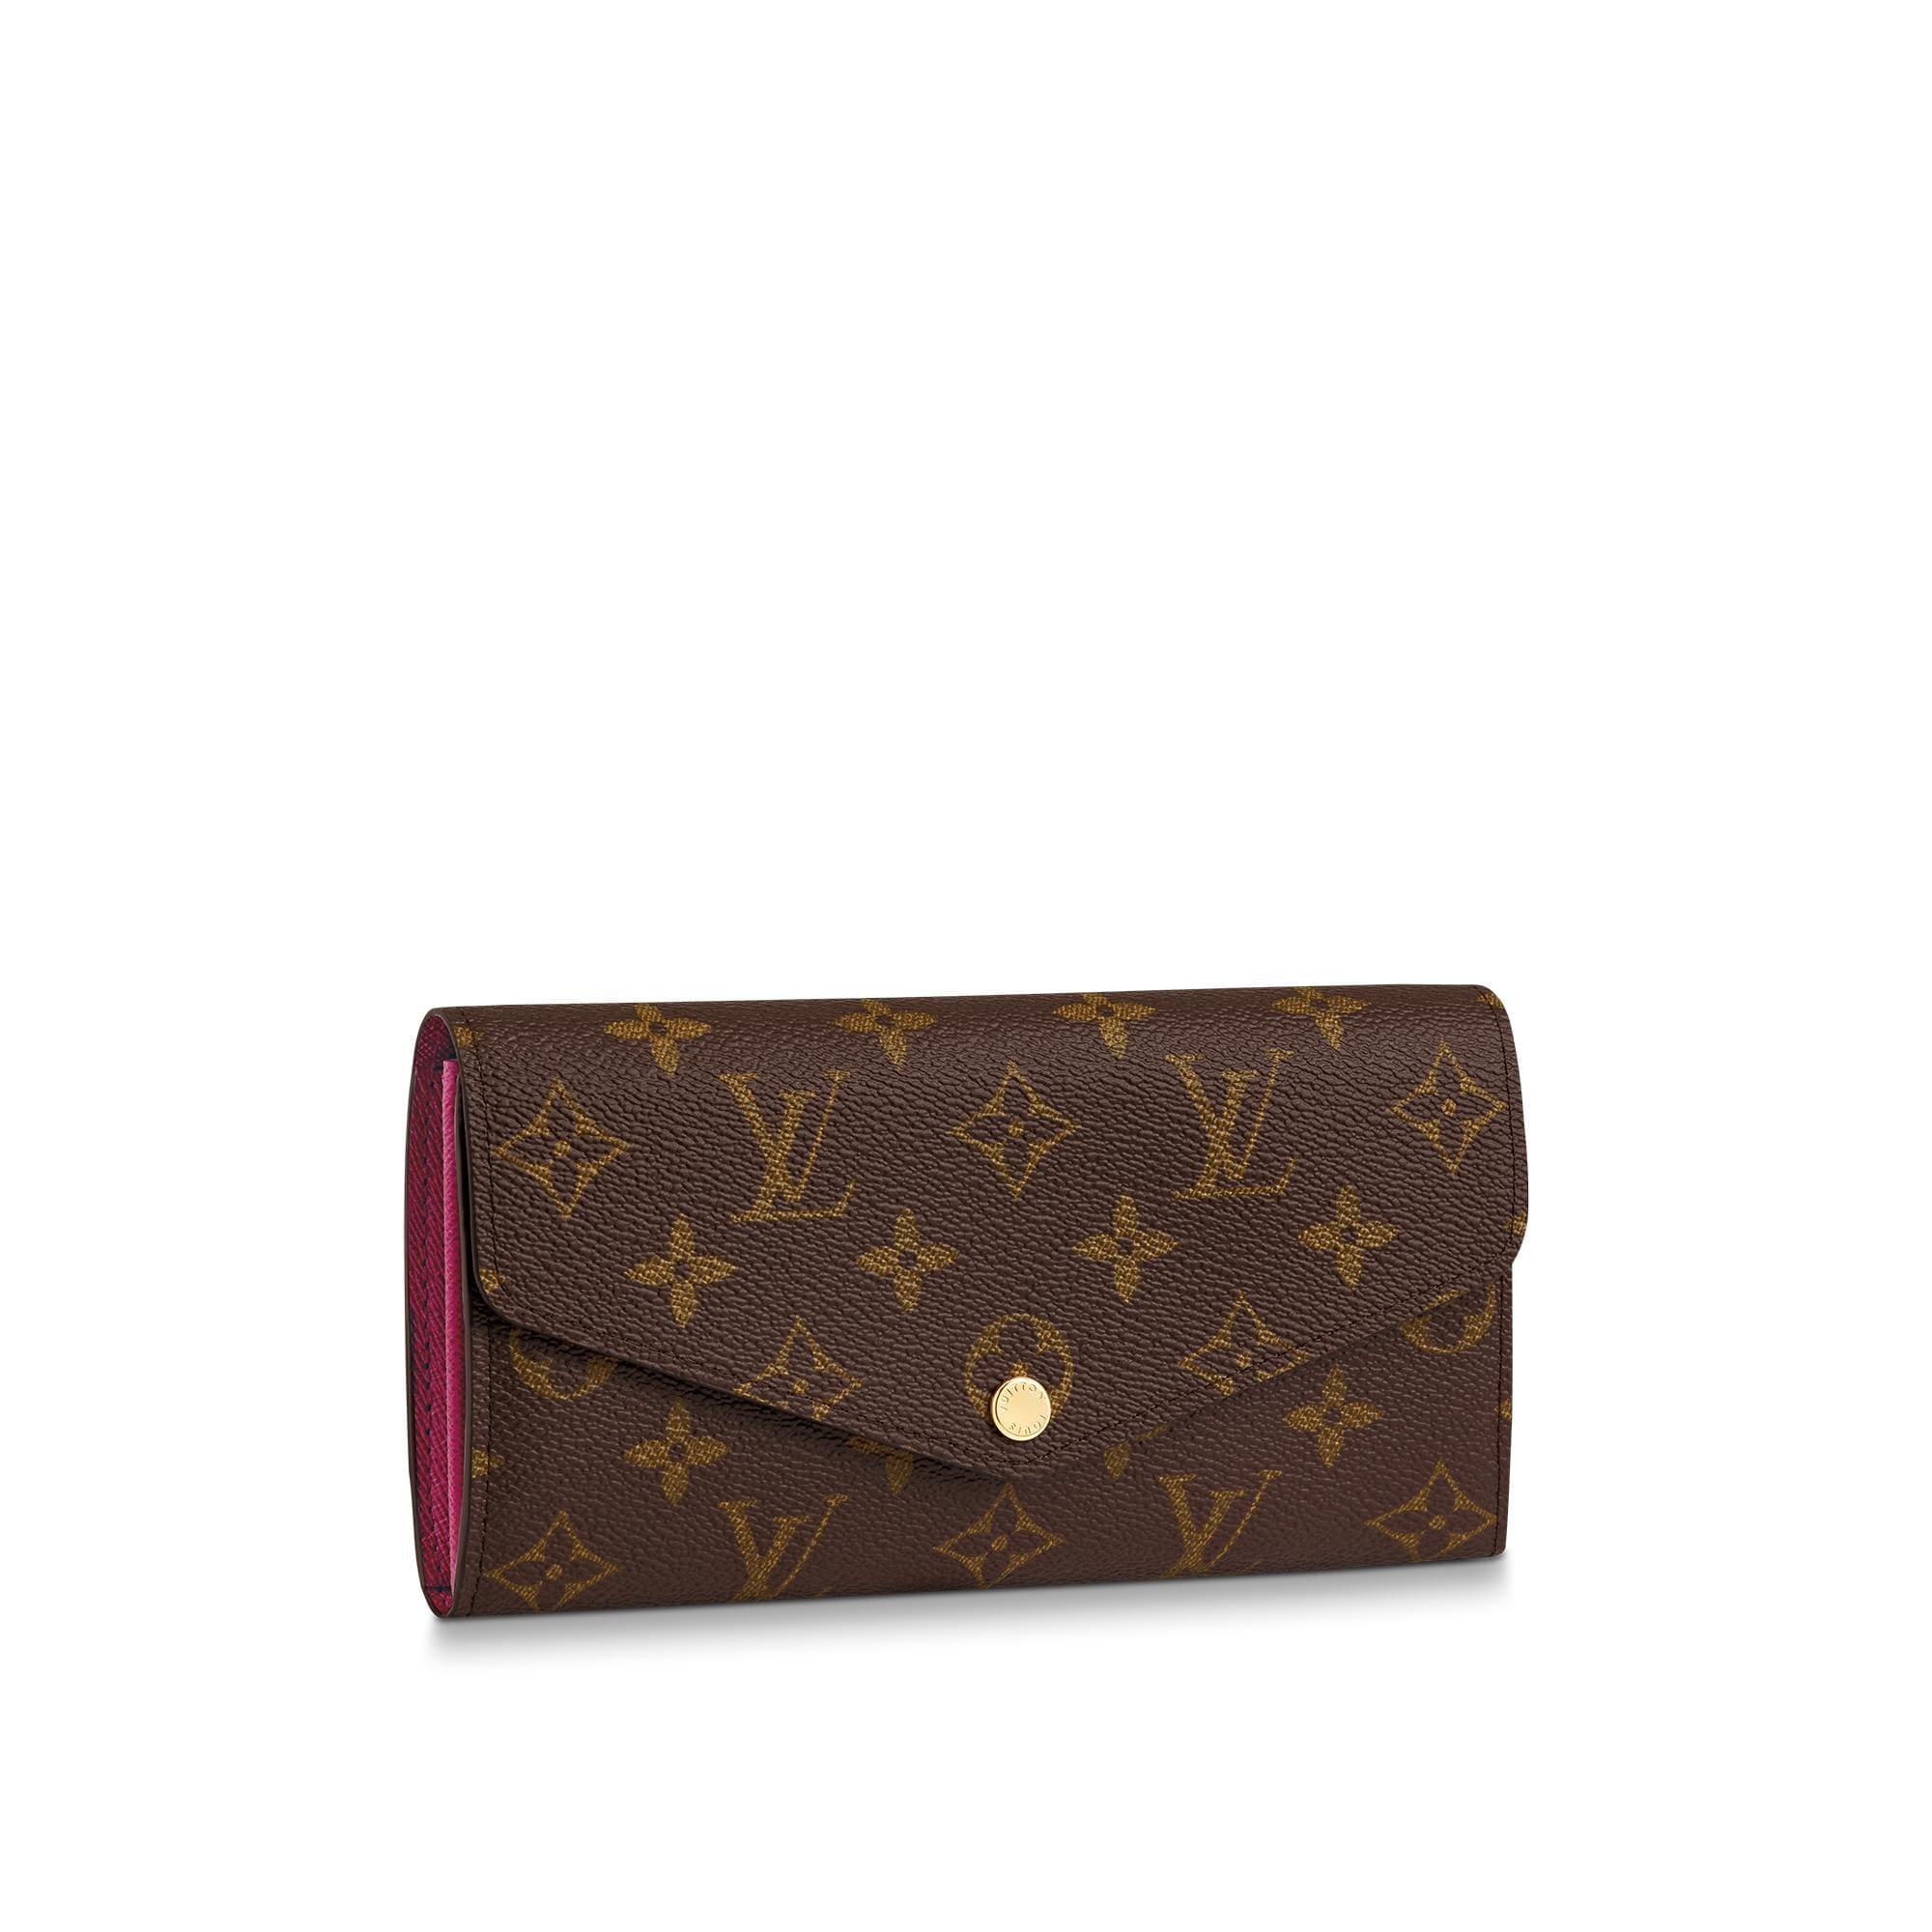 Designer Wallet in Leather  Canvas Sarah  LOUIS VUITTON